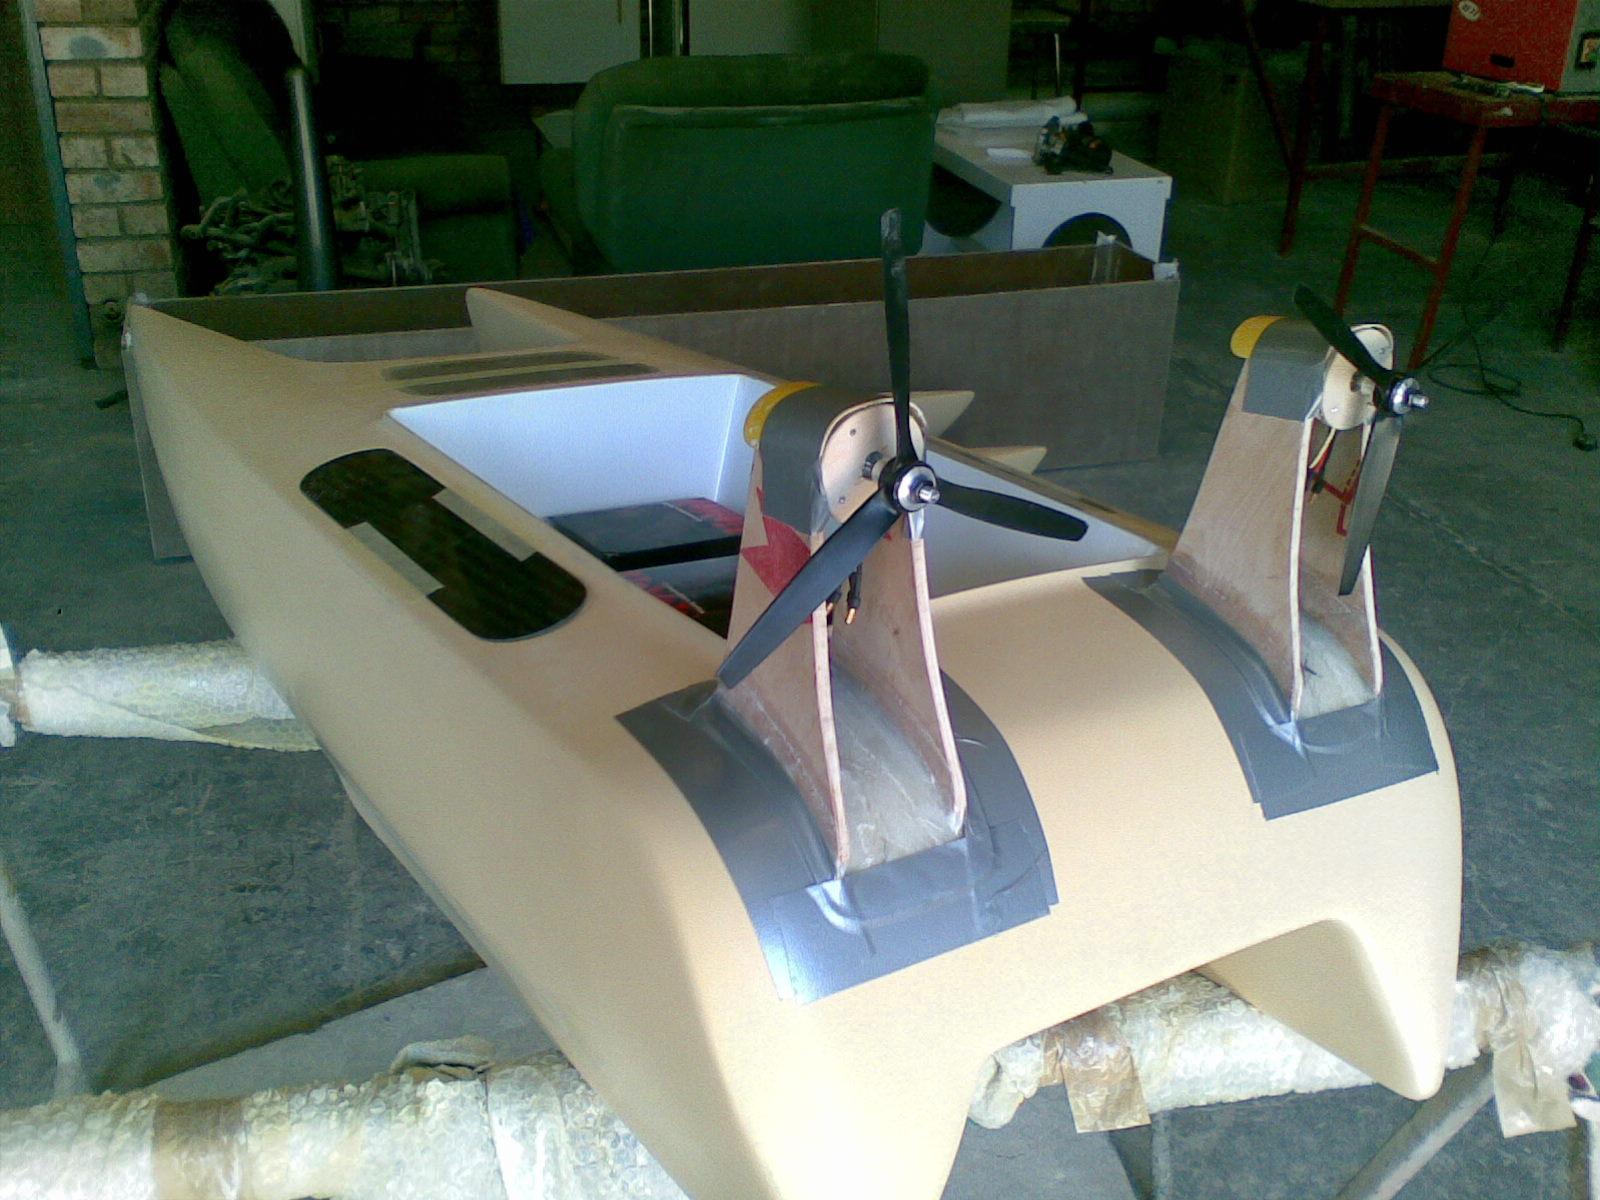 ... Bait Boat Plans Plans PDF Download – DIY Wooden Boat Plans Projects